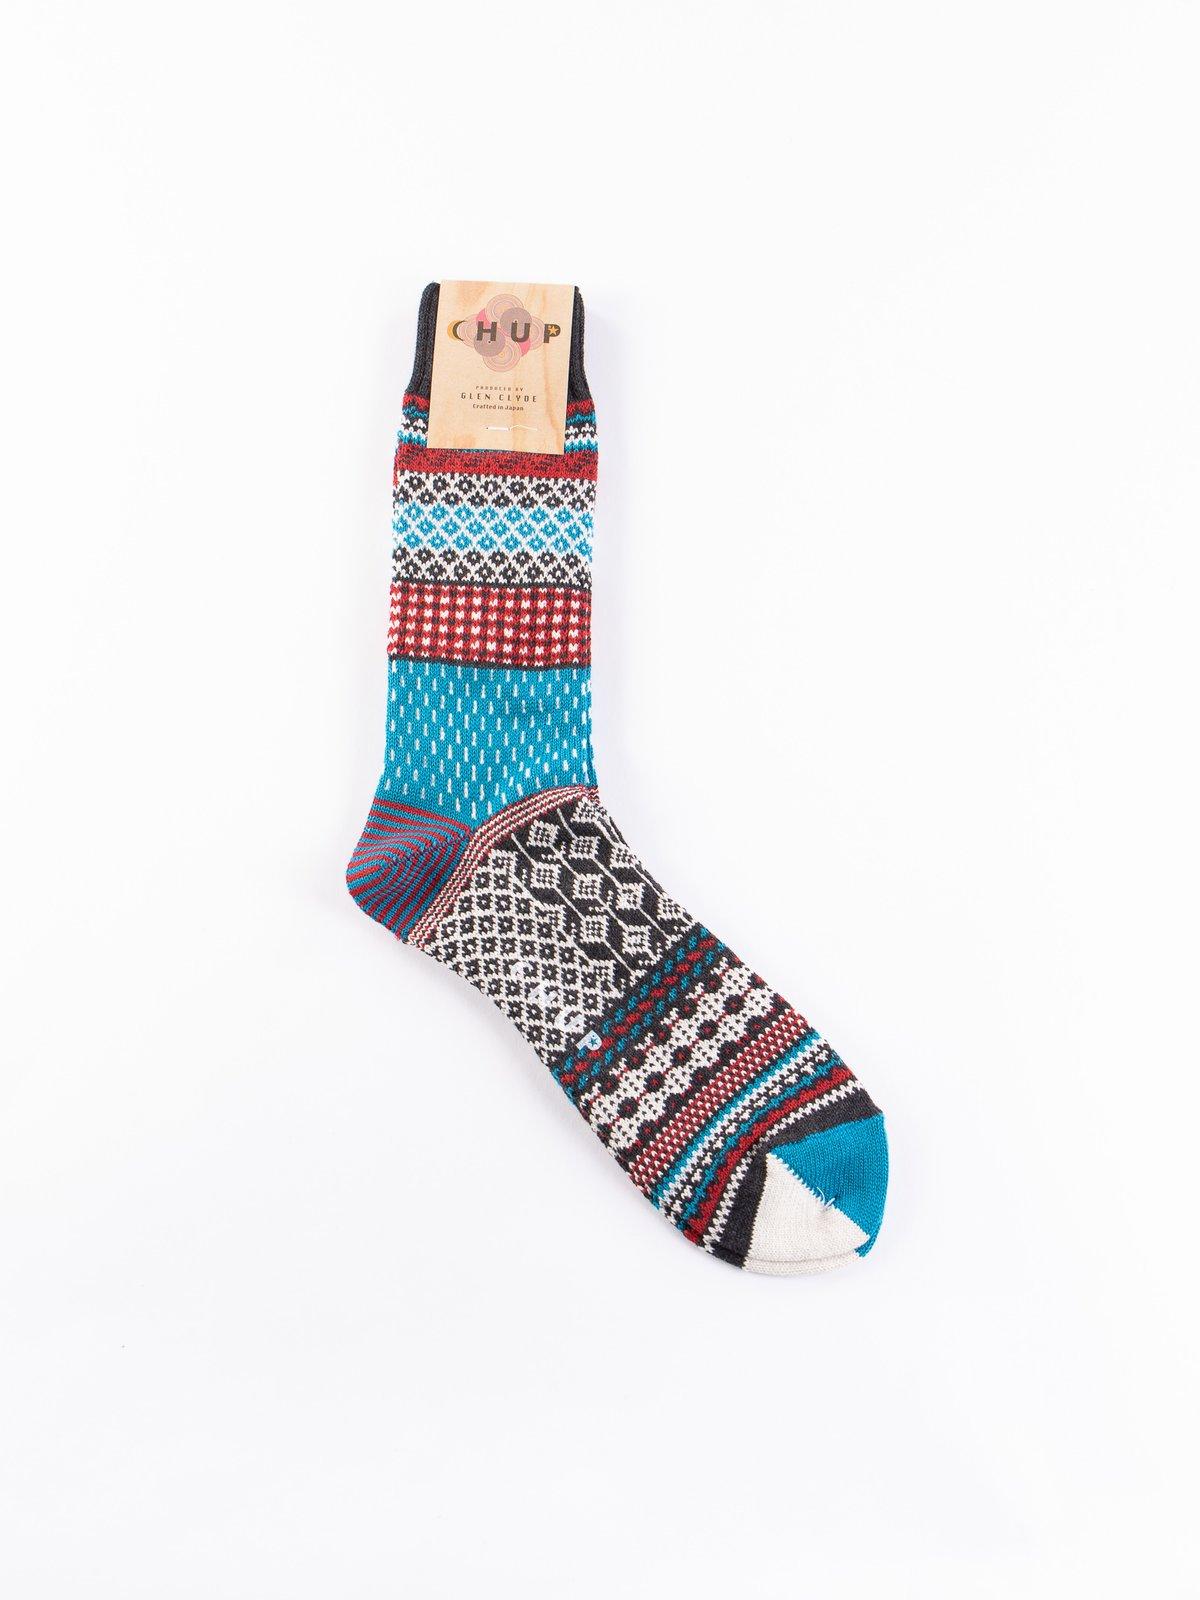 Charcoal Tallinn Socks - Image 1